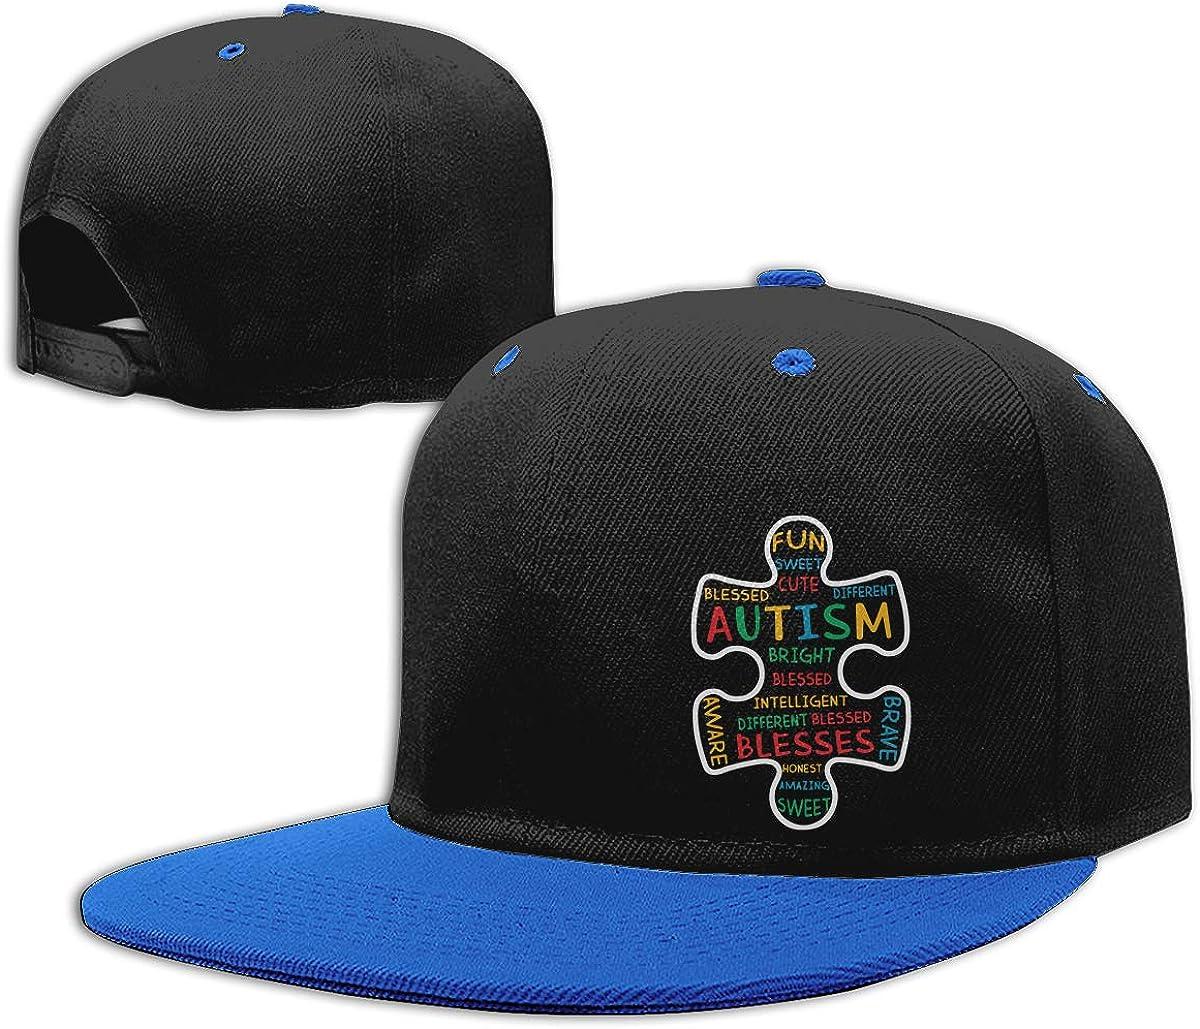 Autism Awareness Puzzle Piece Words Classic Hip Hop Baseball Caps Men Womens Hiphop Cap